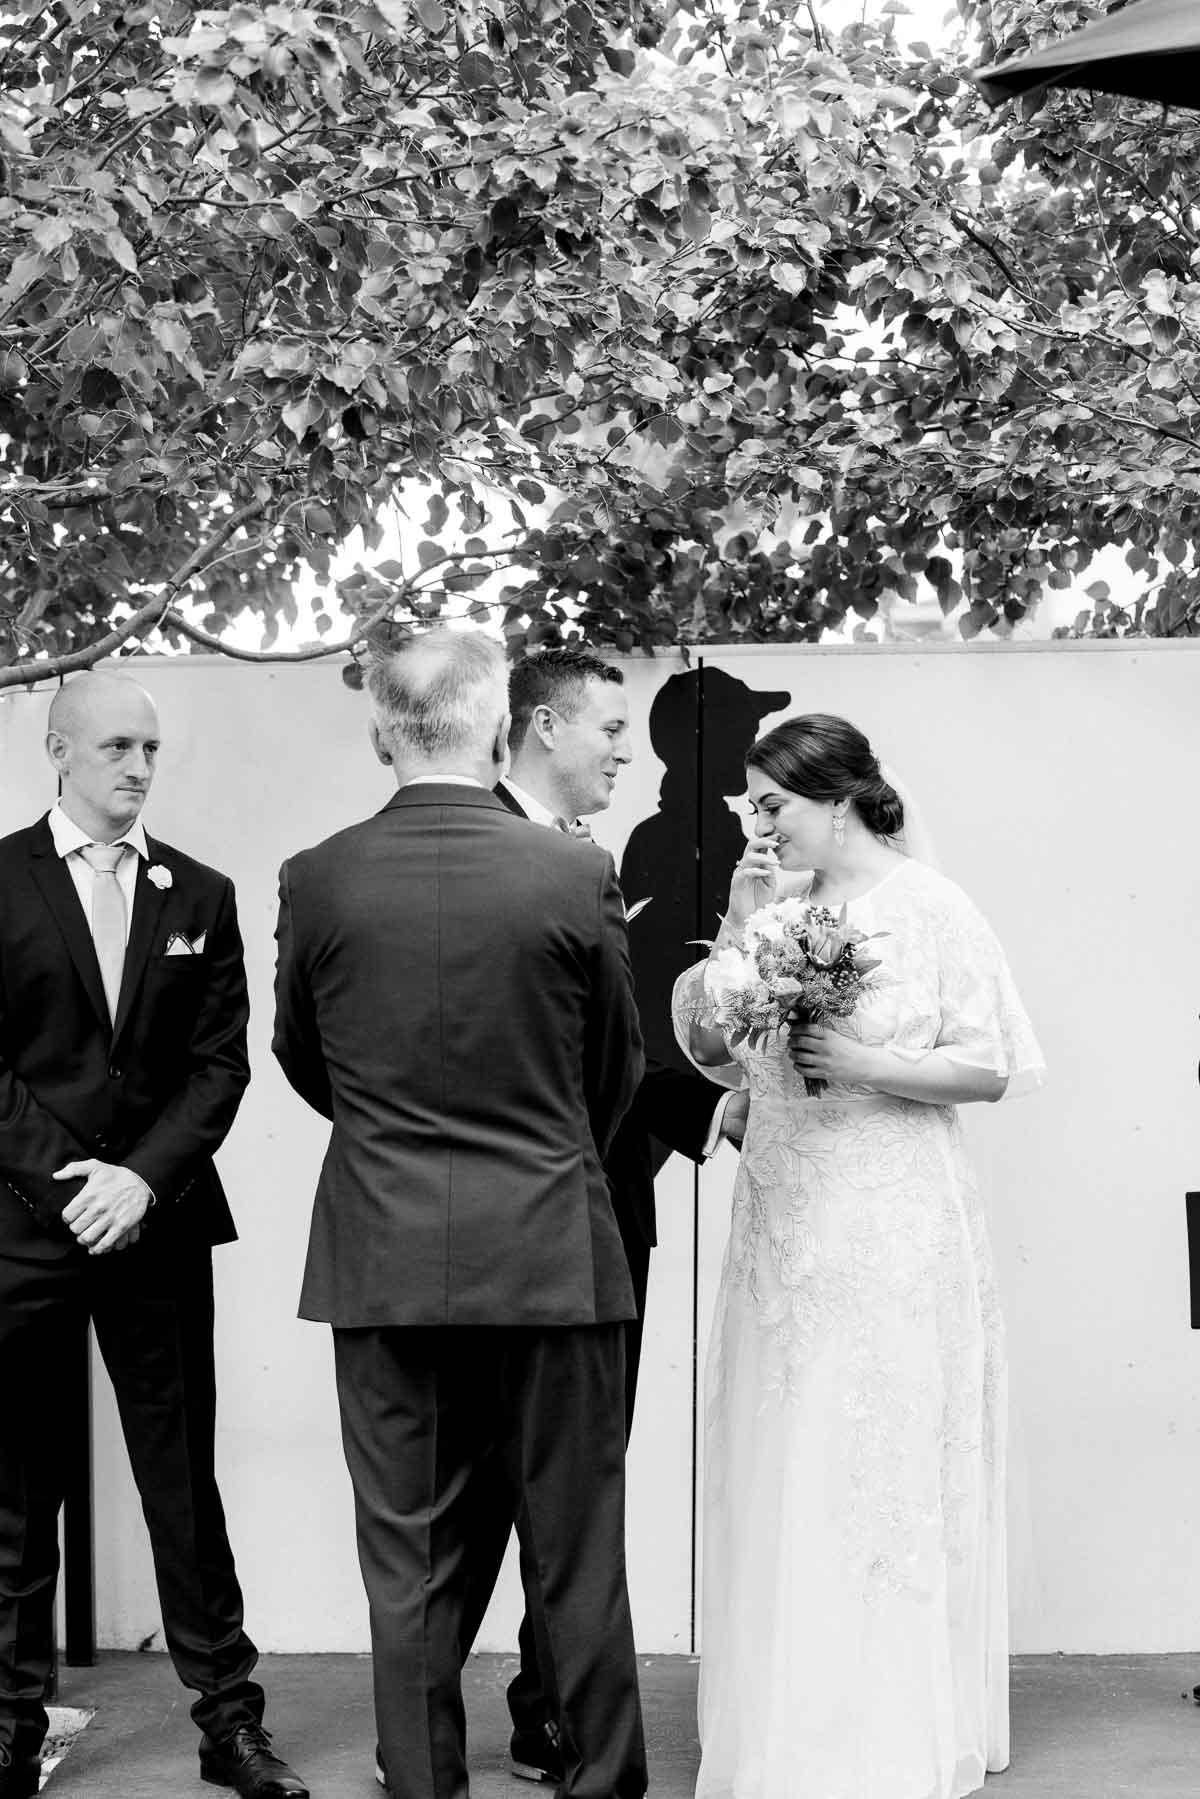 little-henri-cafe-wedding-thornbury-heart+soul-weddings-jane-aaron-05612.jpg